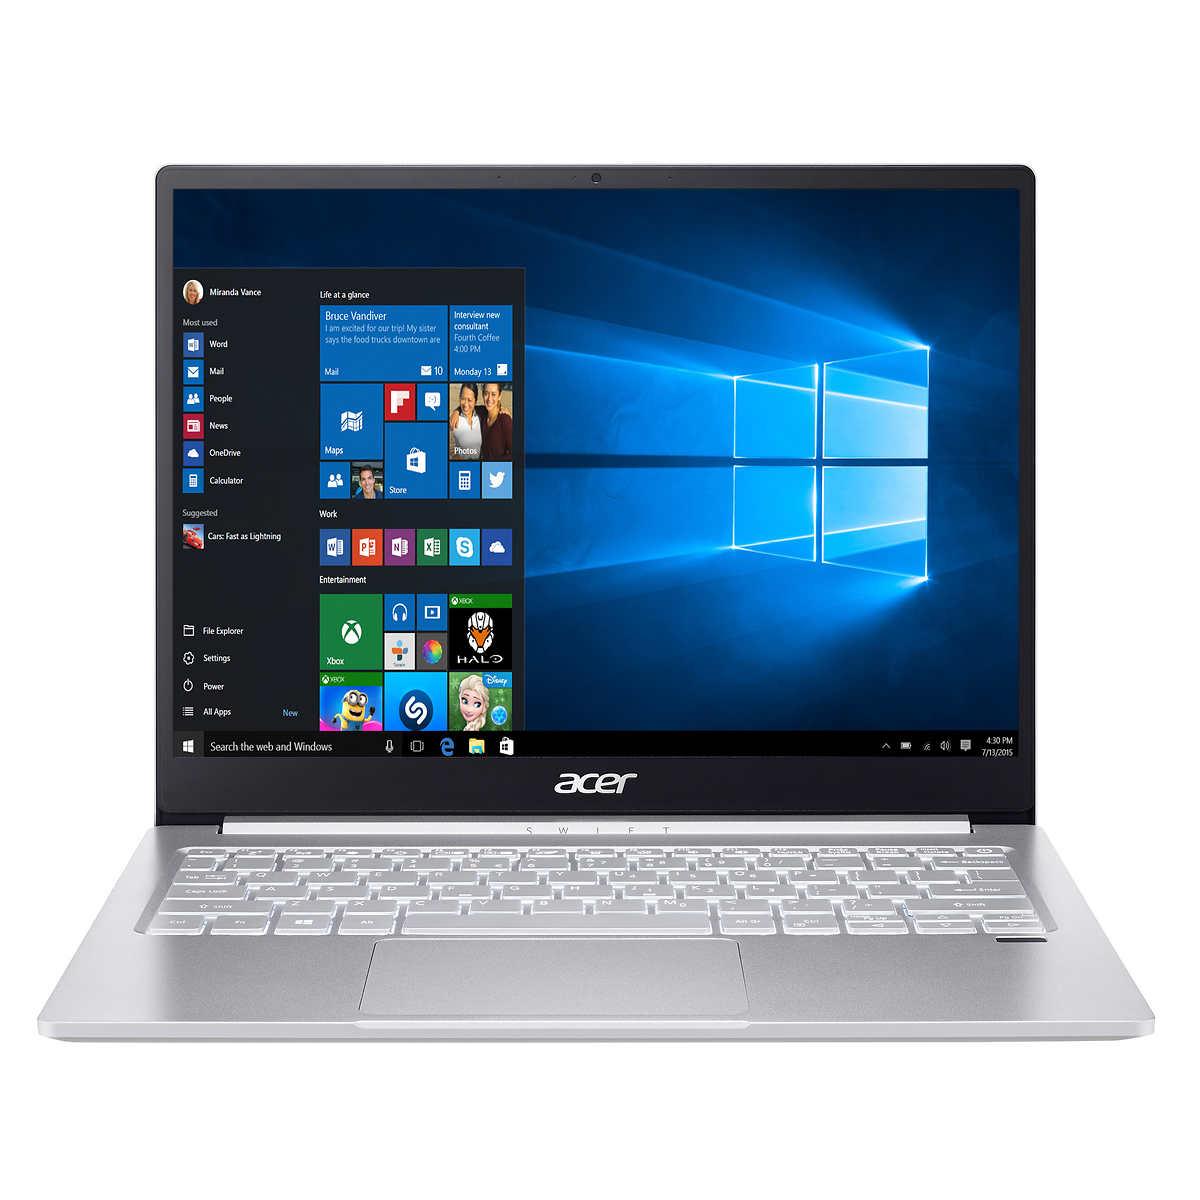 "Acer Swift 3 13.5"" Intel Evo Platform Laptop - 11th Gen Intel i7-1165G7 - 2256 x 1504 Display $800"